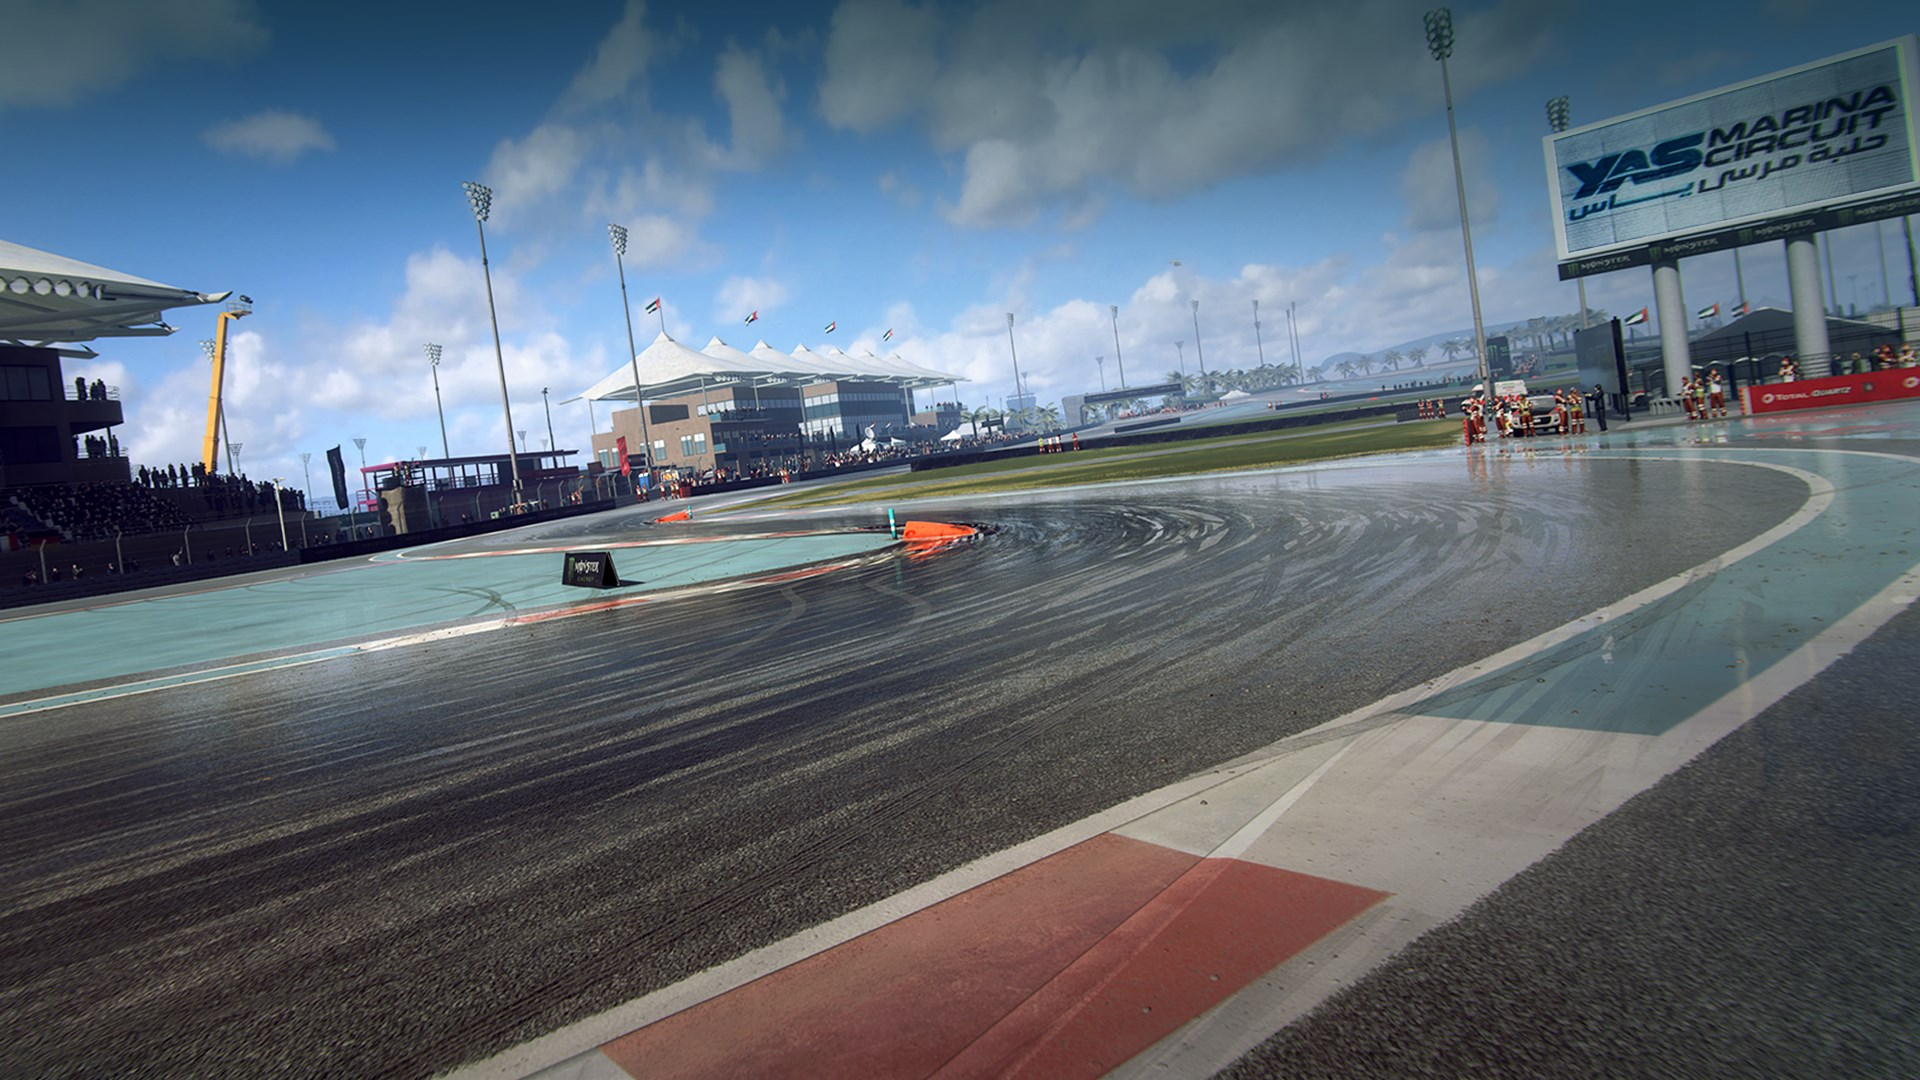 WS - Yas Marina Circuit, Abu Dhabi (Rallycross Track)